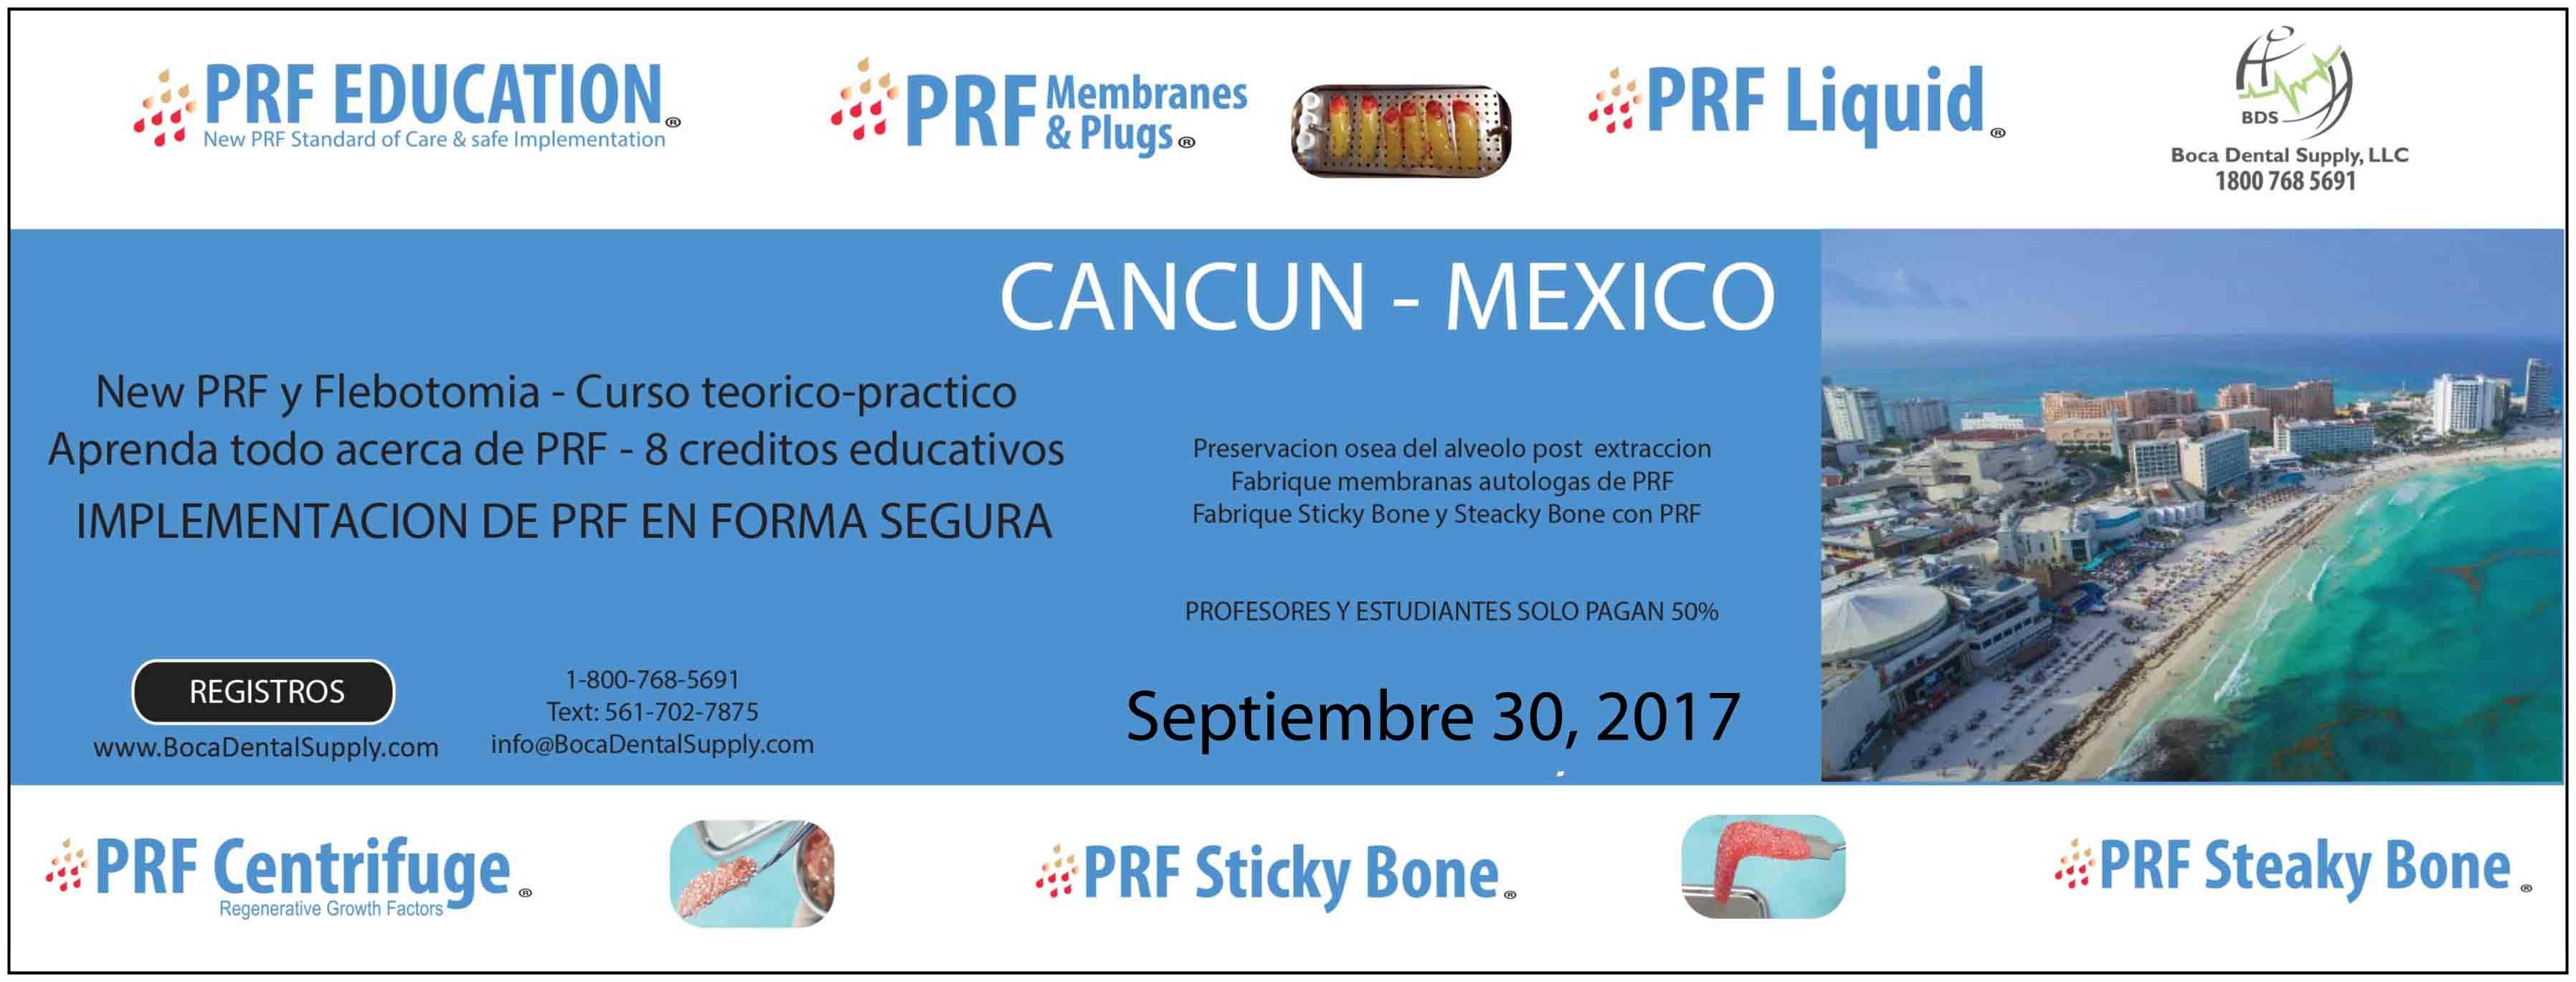 prf-course-cancun-spanish-sep-30.jpg